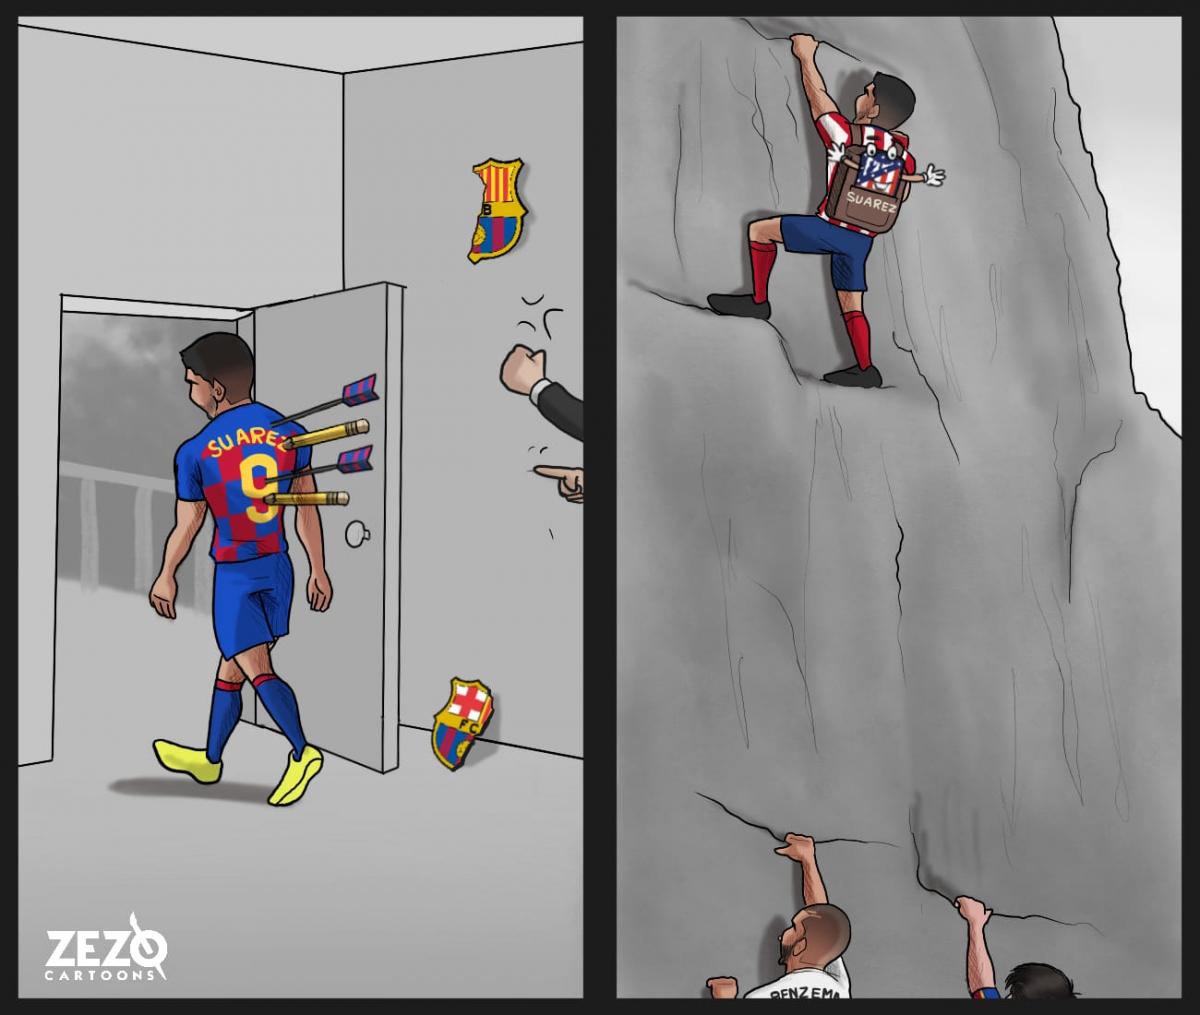 Luis Suarez chứng minh giá trị ở Atletico Madrid. (Ảnh: ZEZO Cartoons)